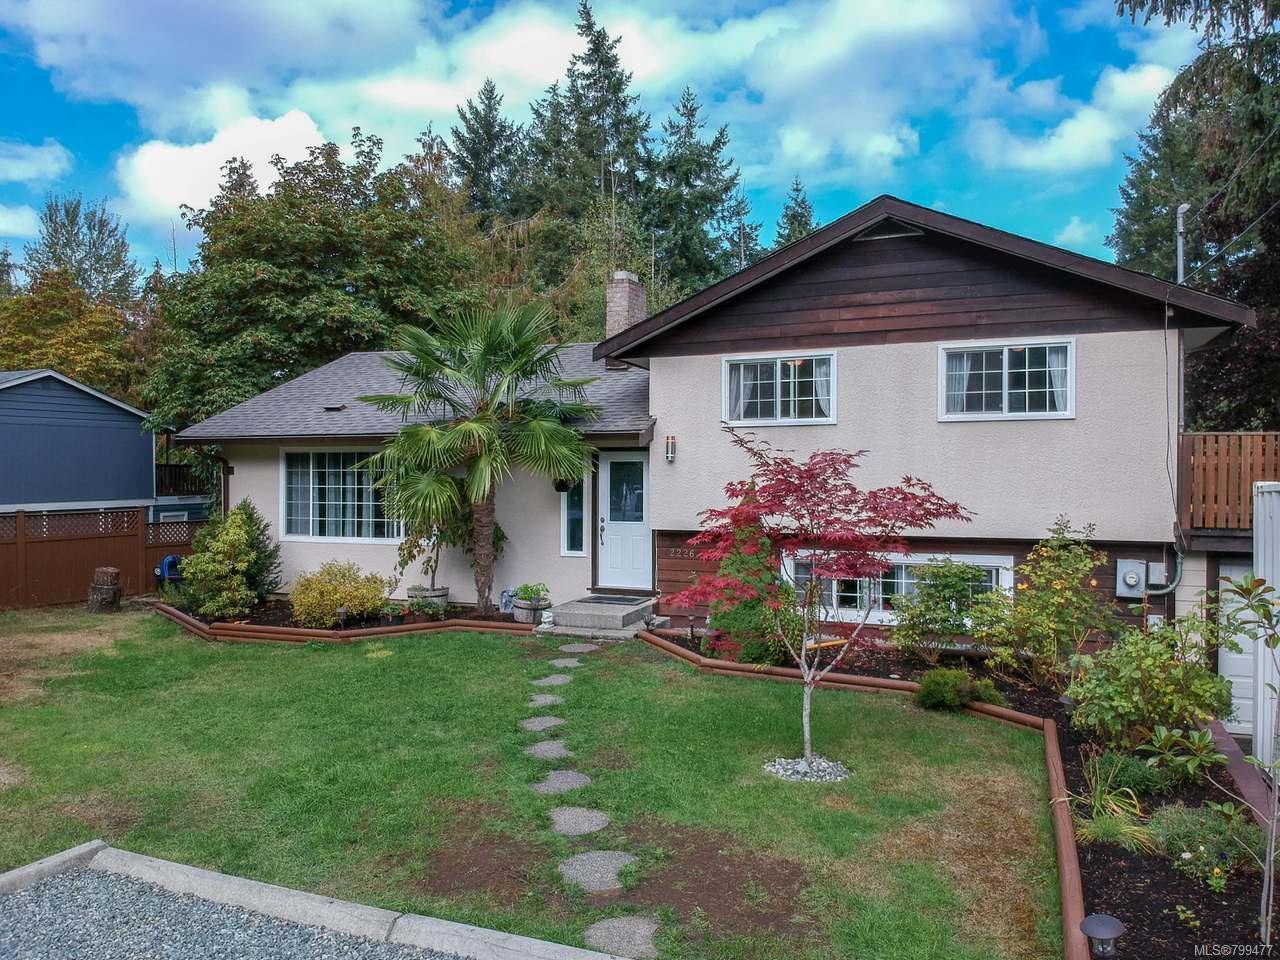 Main Photo: 2226 Blue Jay Way in NANAIMO: Na Cedar House for sale (Nanaimo)  : MLS®# 799477